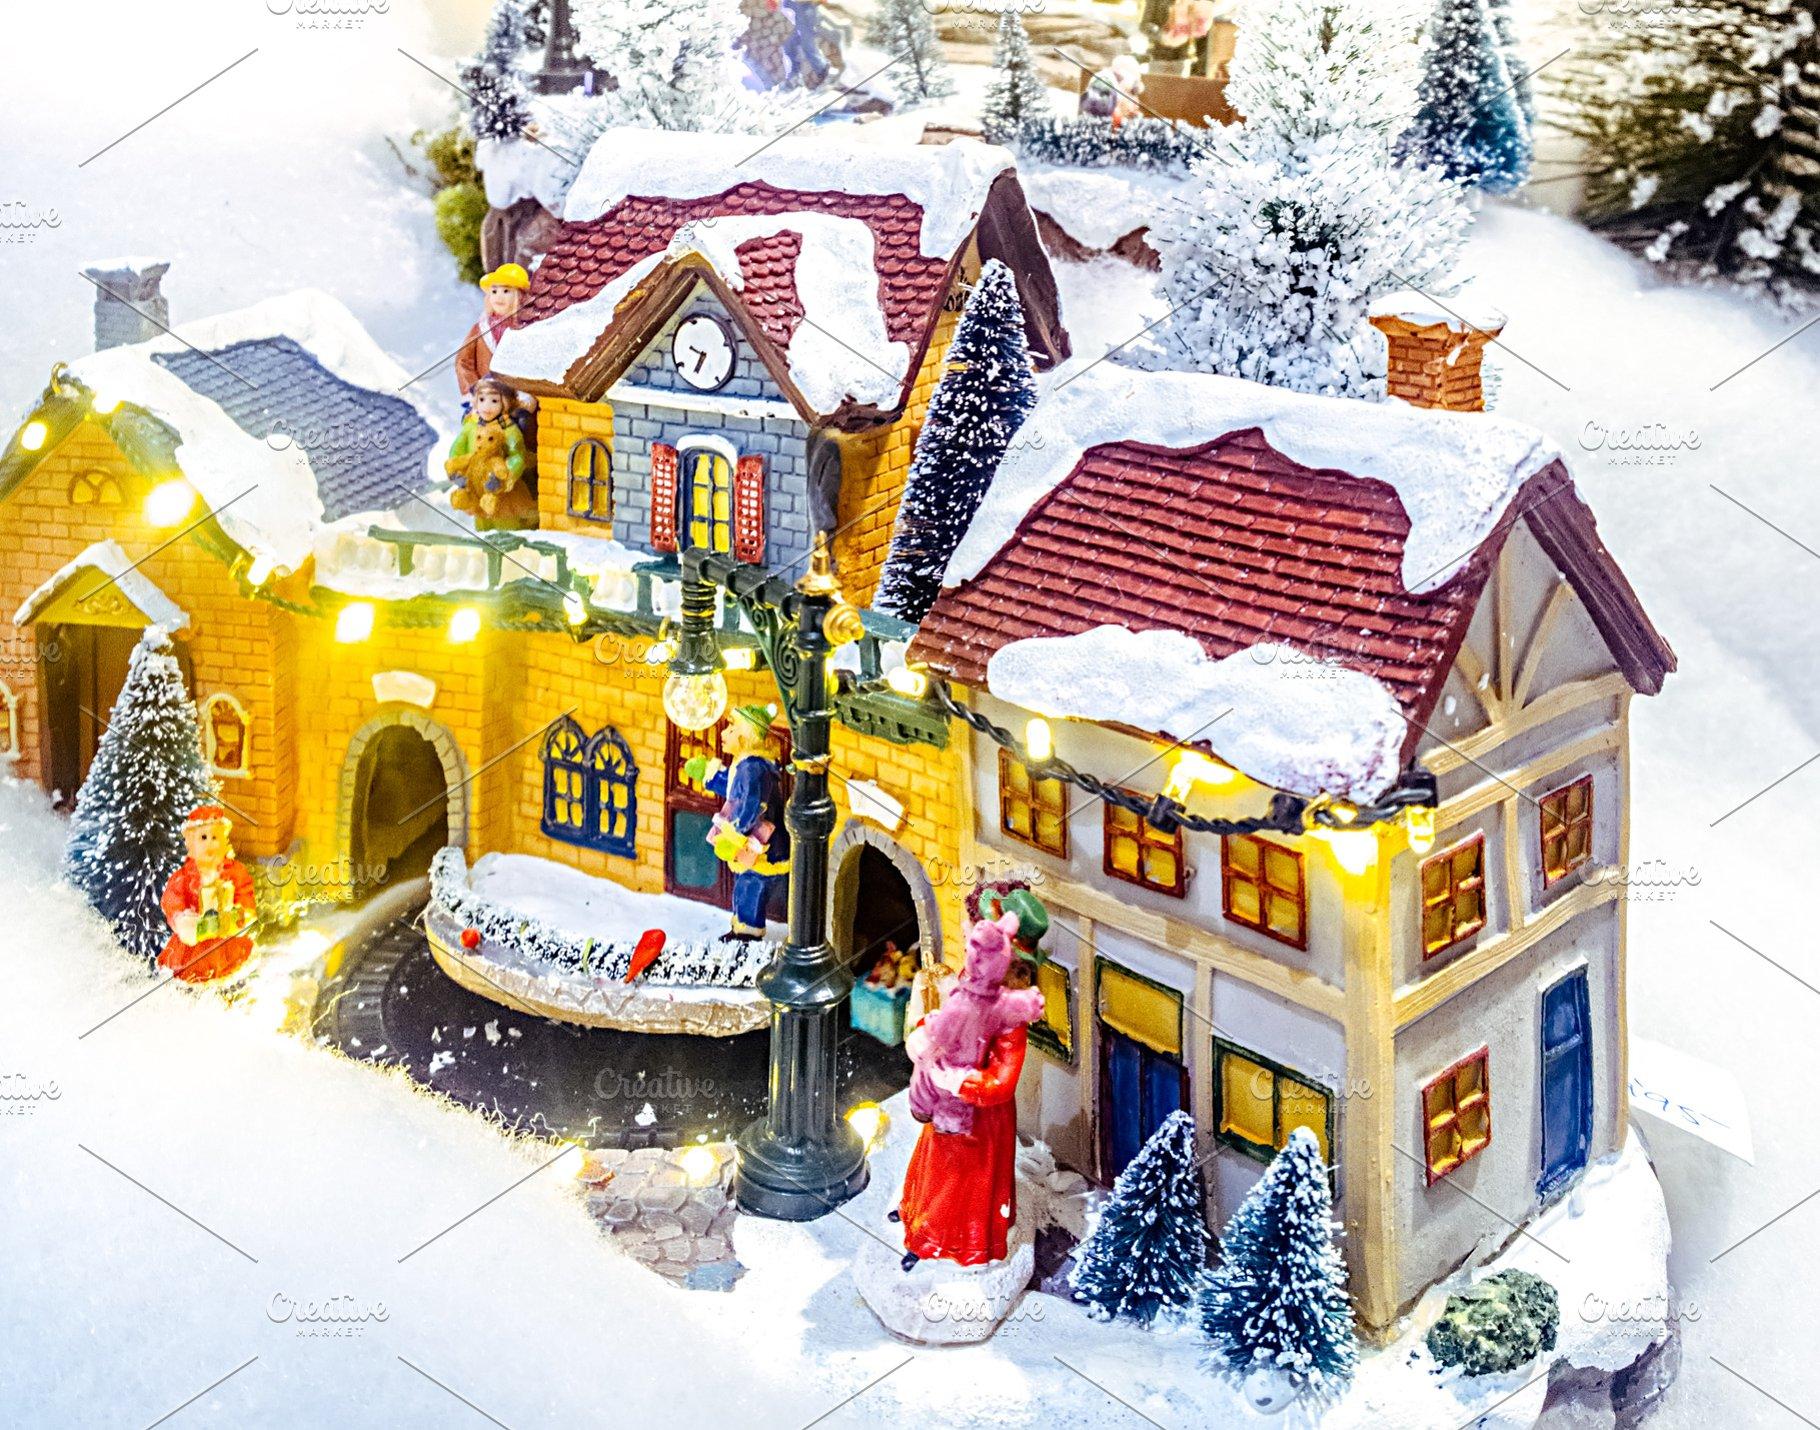 Miniature Christmas Village.Miniature Christmas Village Scene